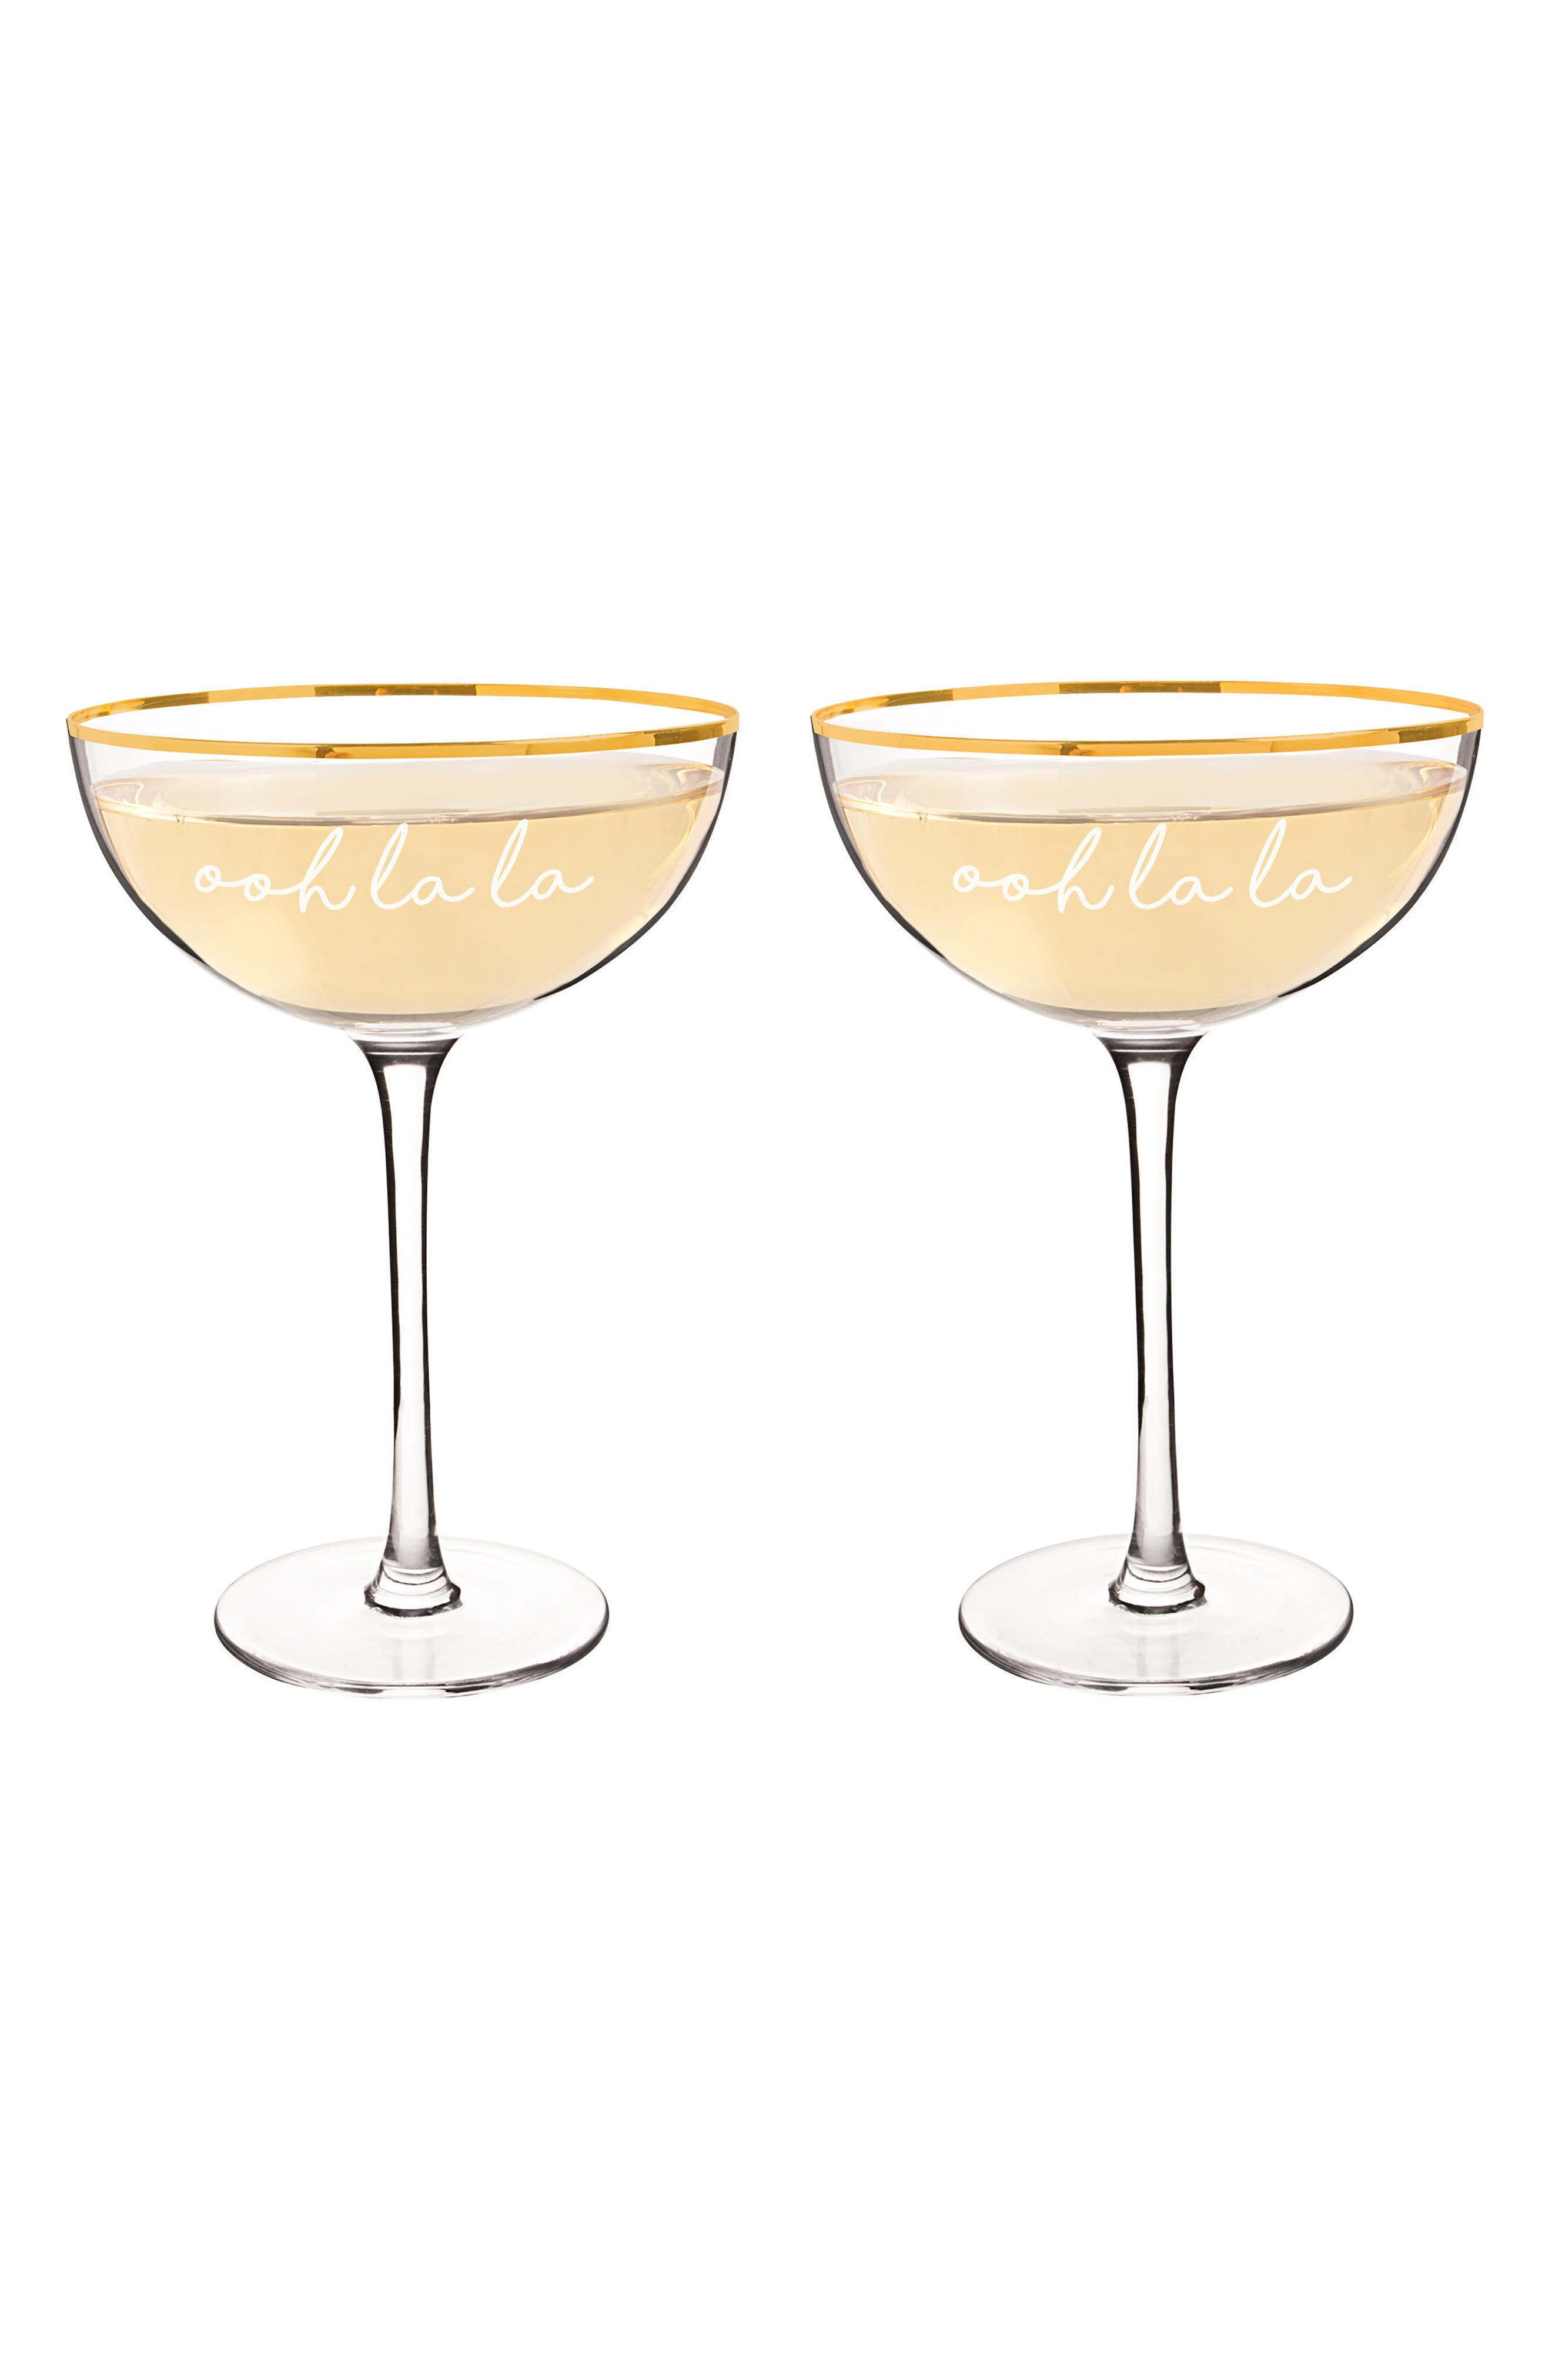 Cathy's Concepts Ooh La La Set of 2 Champagne Coupes